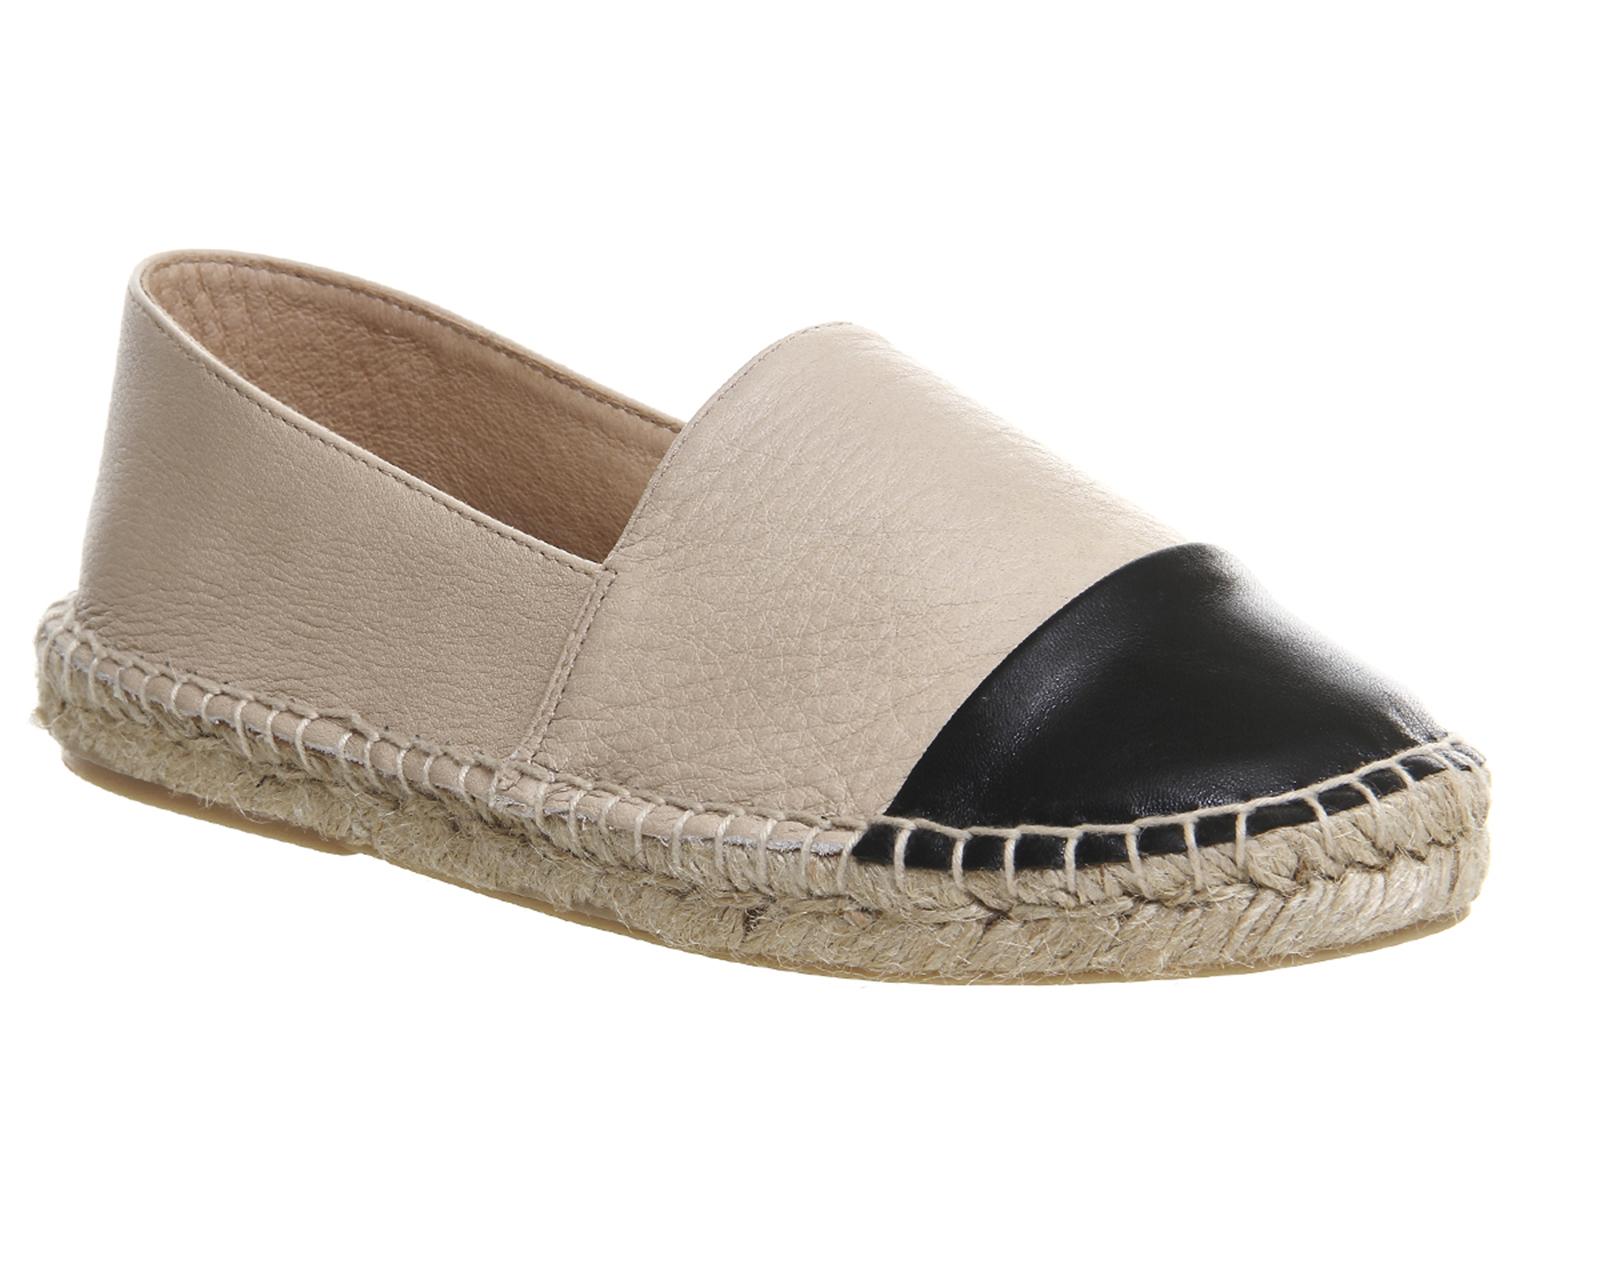 Office Flat Shoes Black